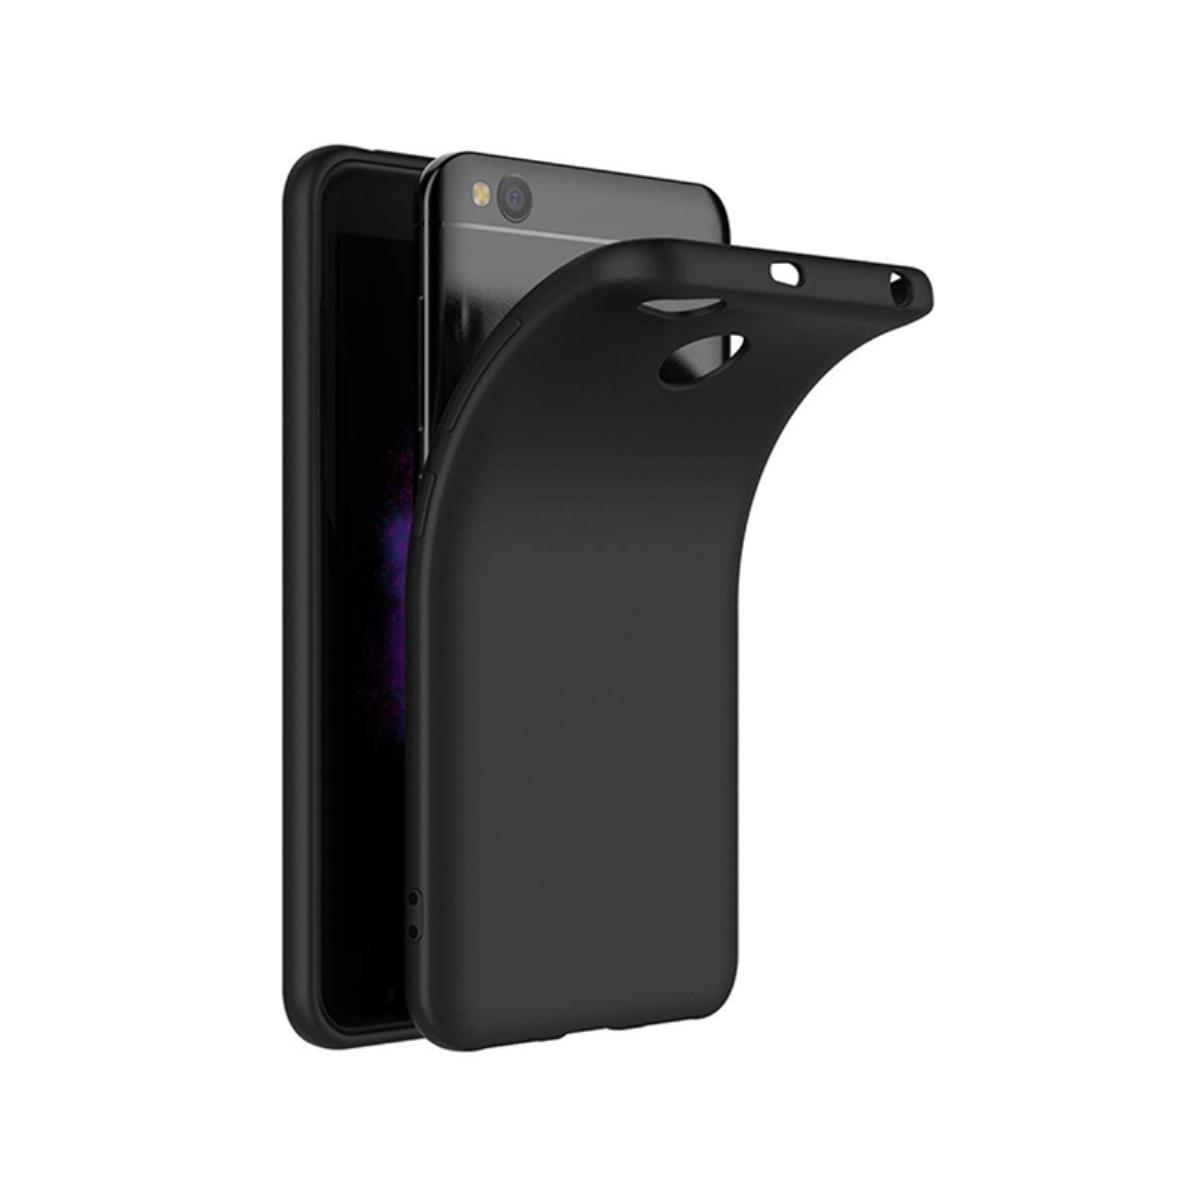 XIAOMI REDMI 5 DUAL SIM 16GB/2GB RAM LTE PRETO